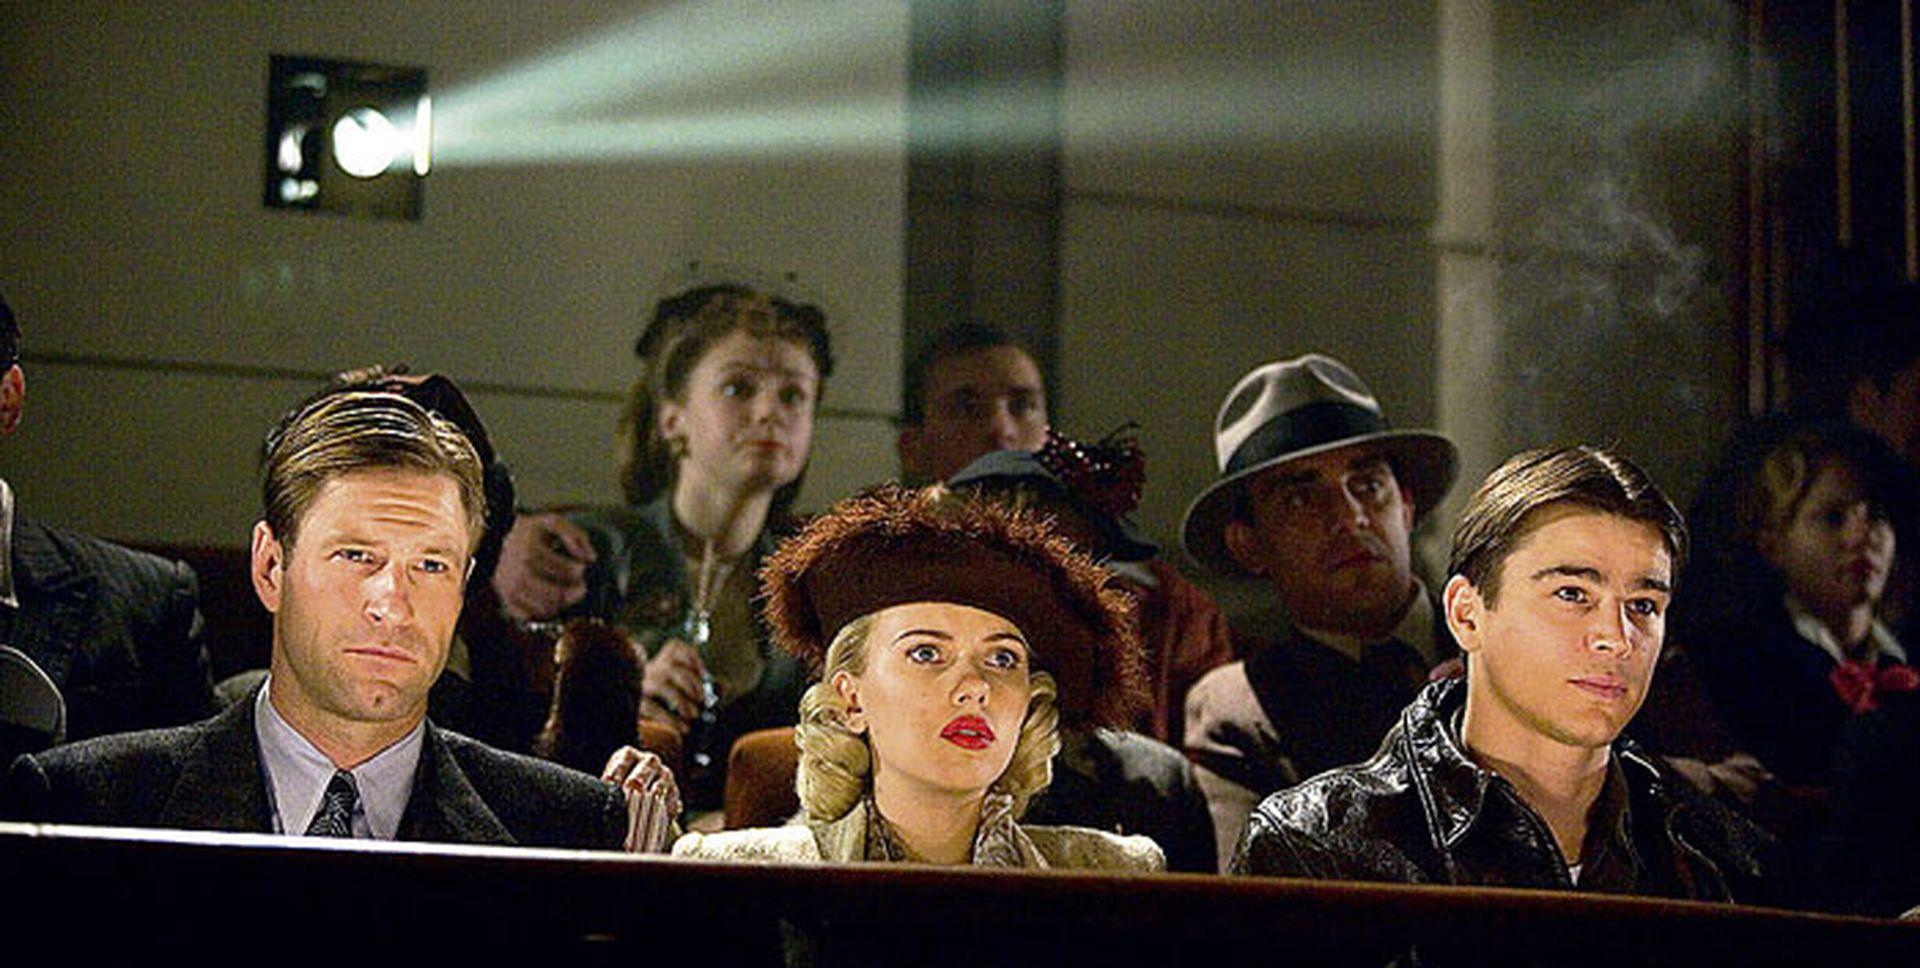 Aaron Eckhart, Scarlett Johansson y Josh Hartnett en La dalia negra, sobre la novela de James Ellroy